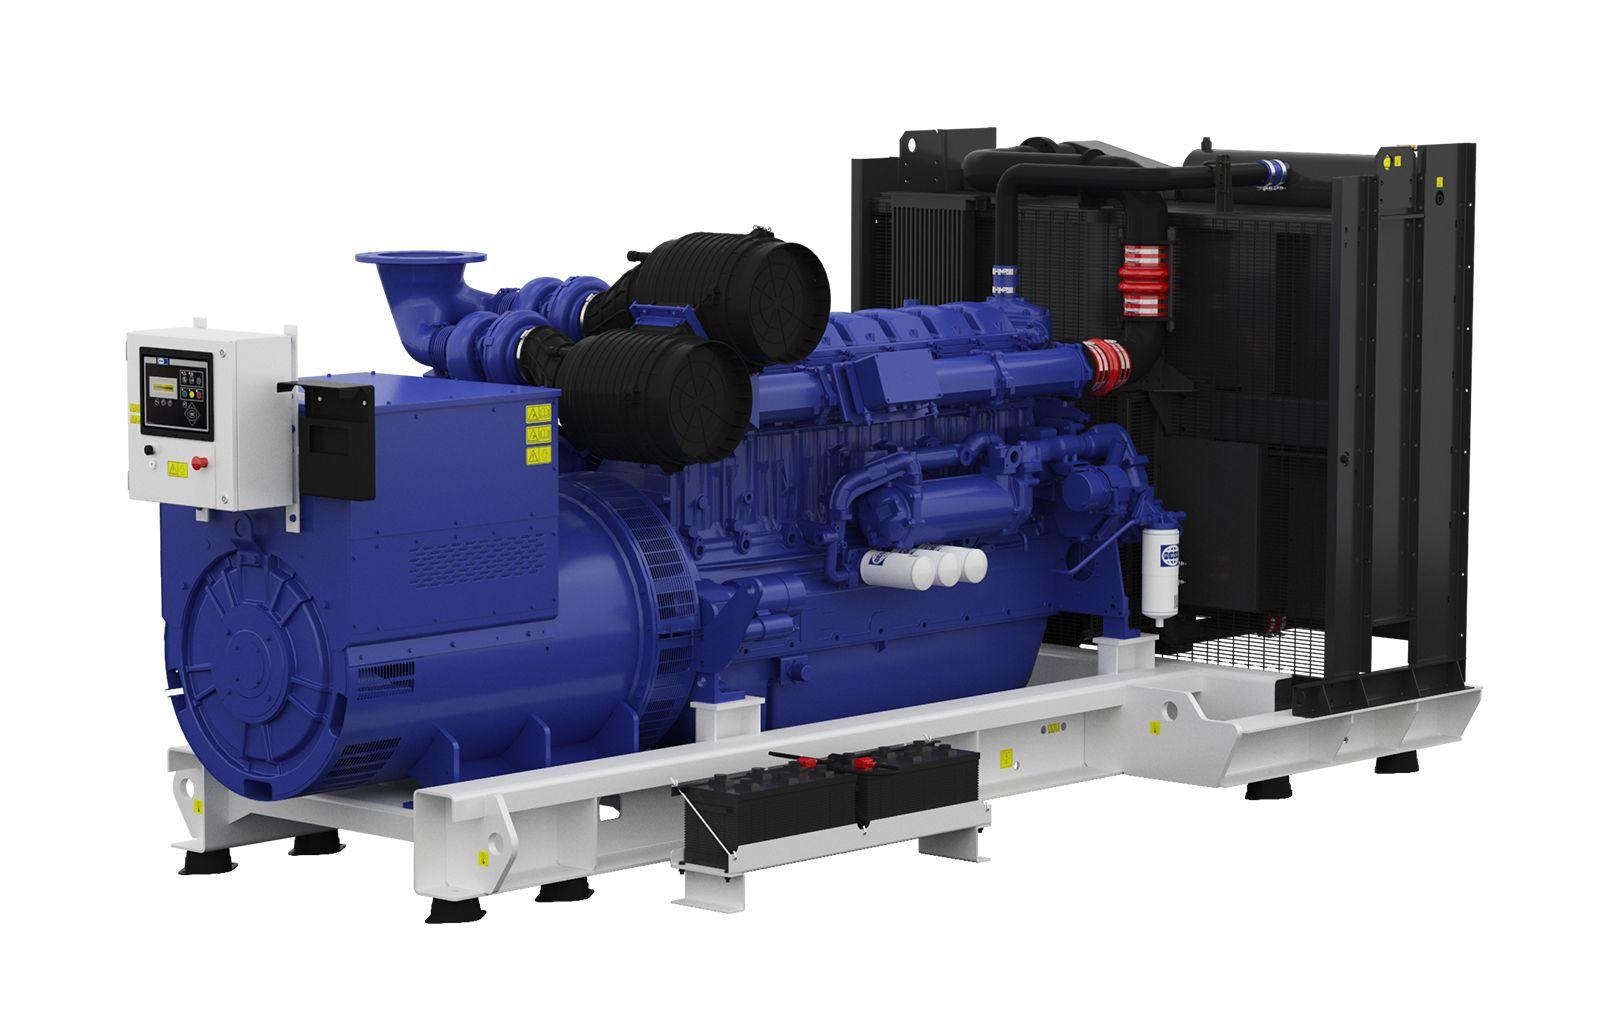 FG Wilson P910 generator set